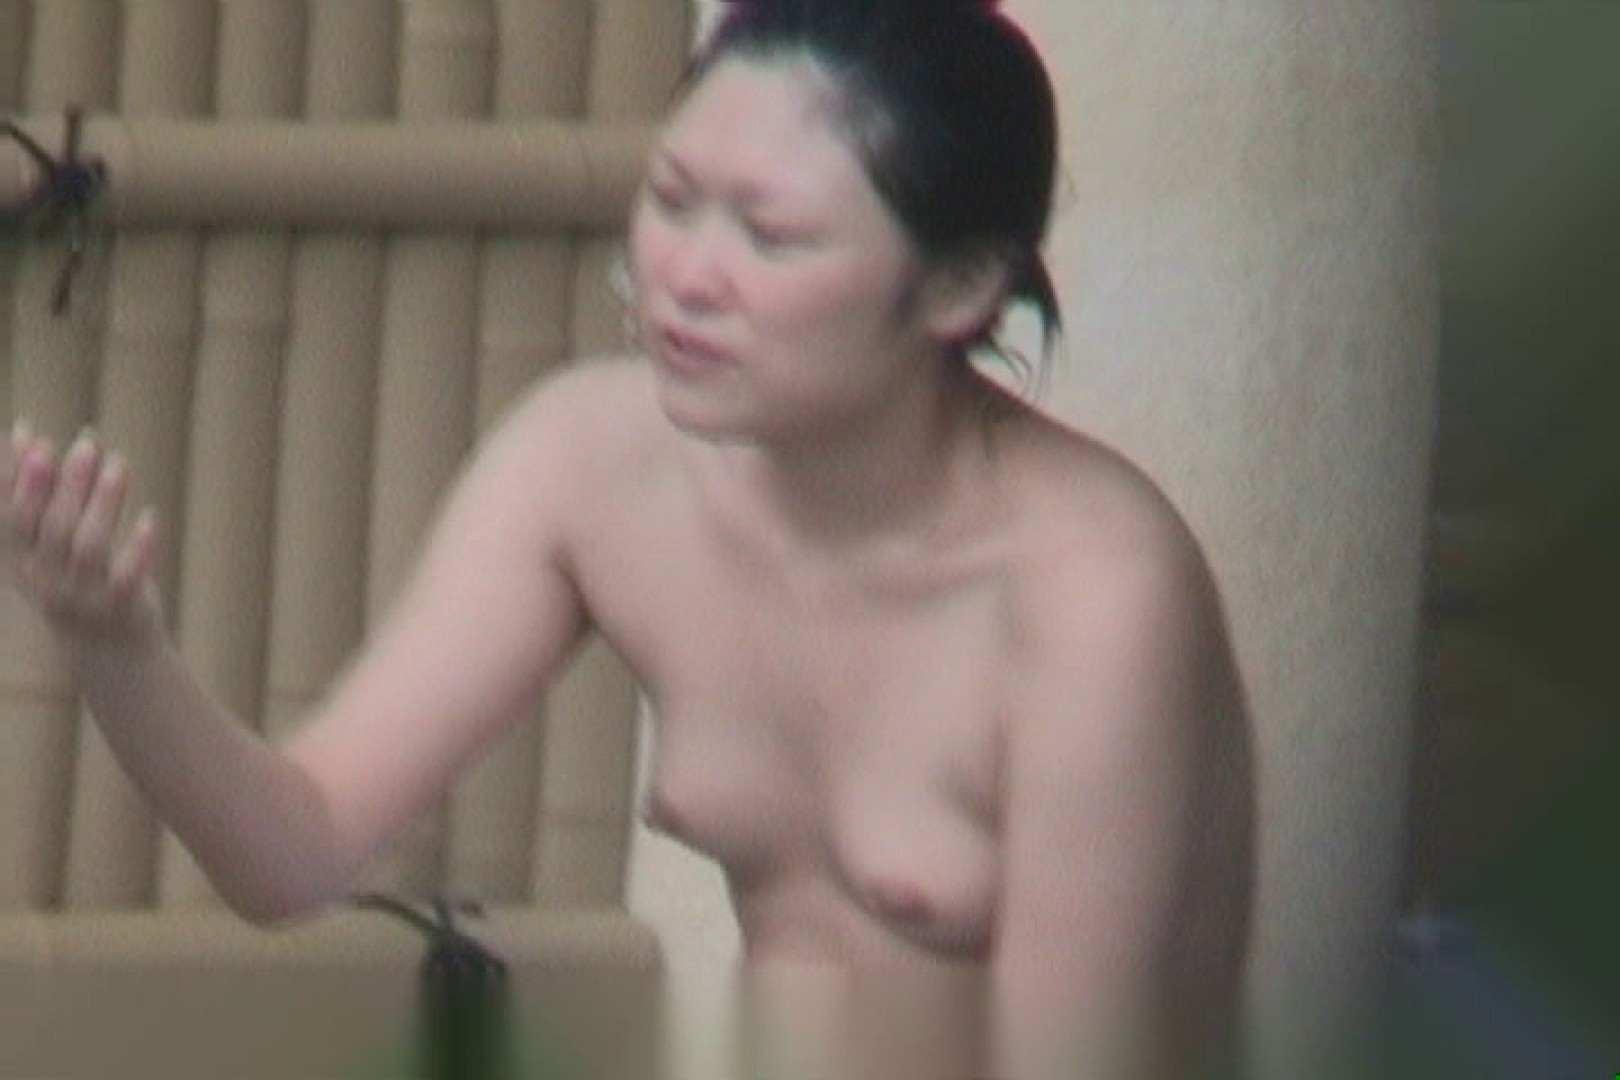 Aquaな露天風呂Vol.601 HなOL 戯れ無修正画像 99pic 82